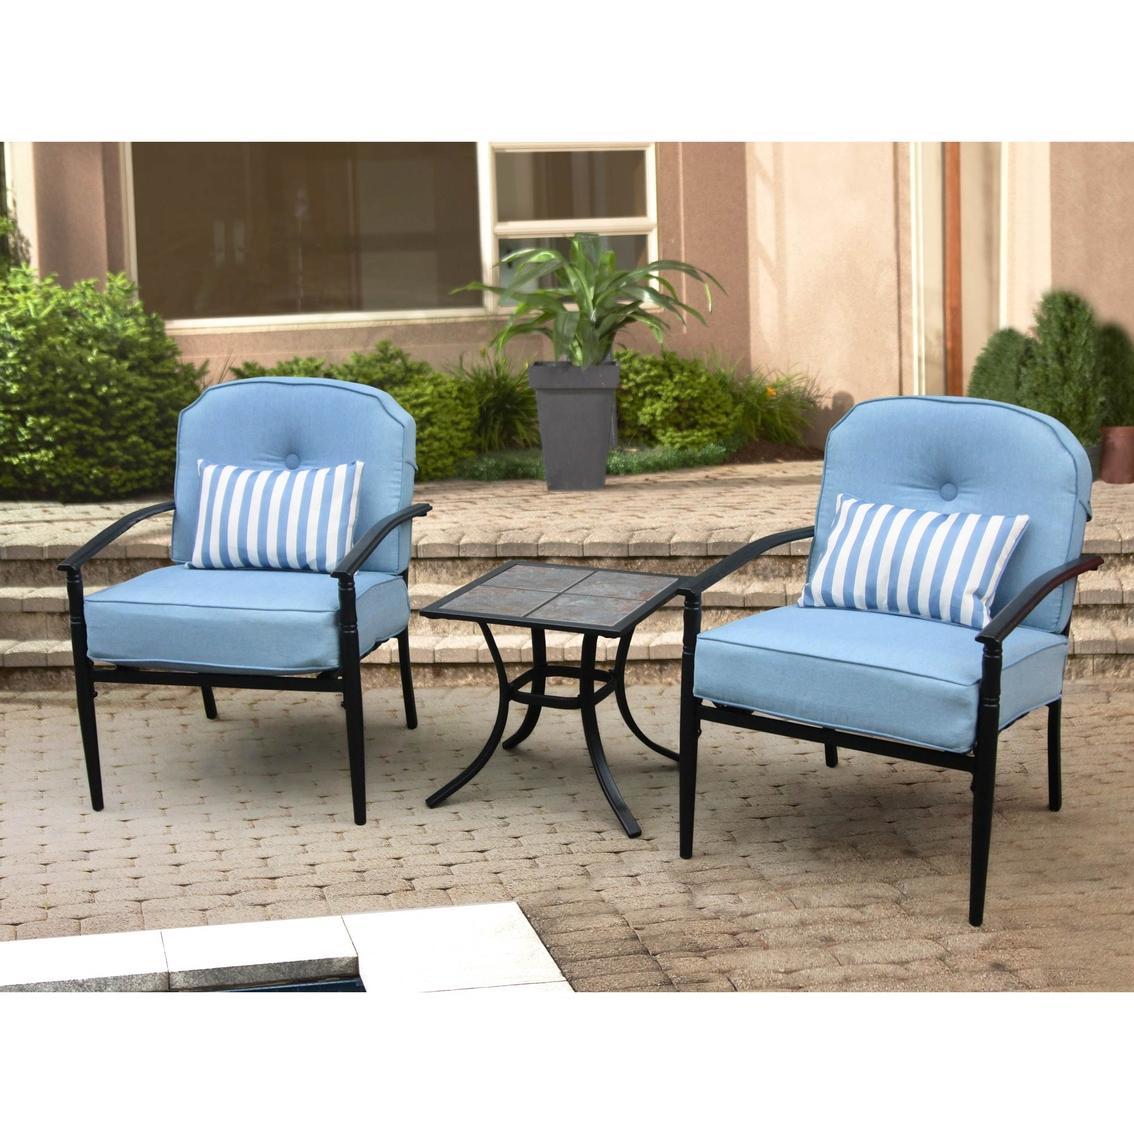 Courtyard Creations Joliet 3 Pc Cushioned Bistro Set